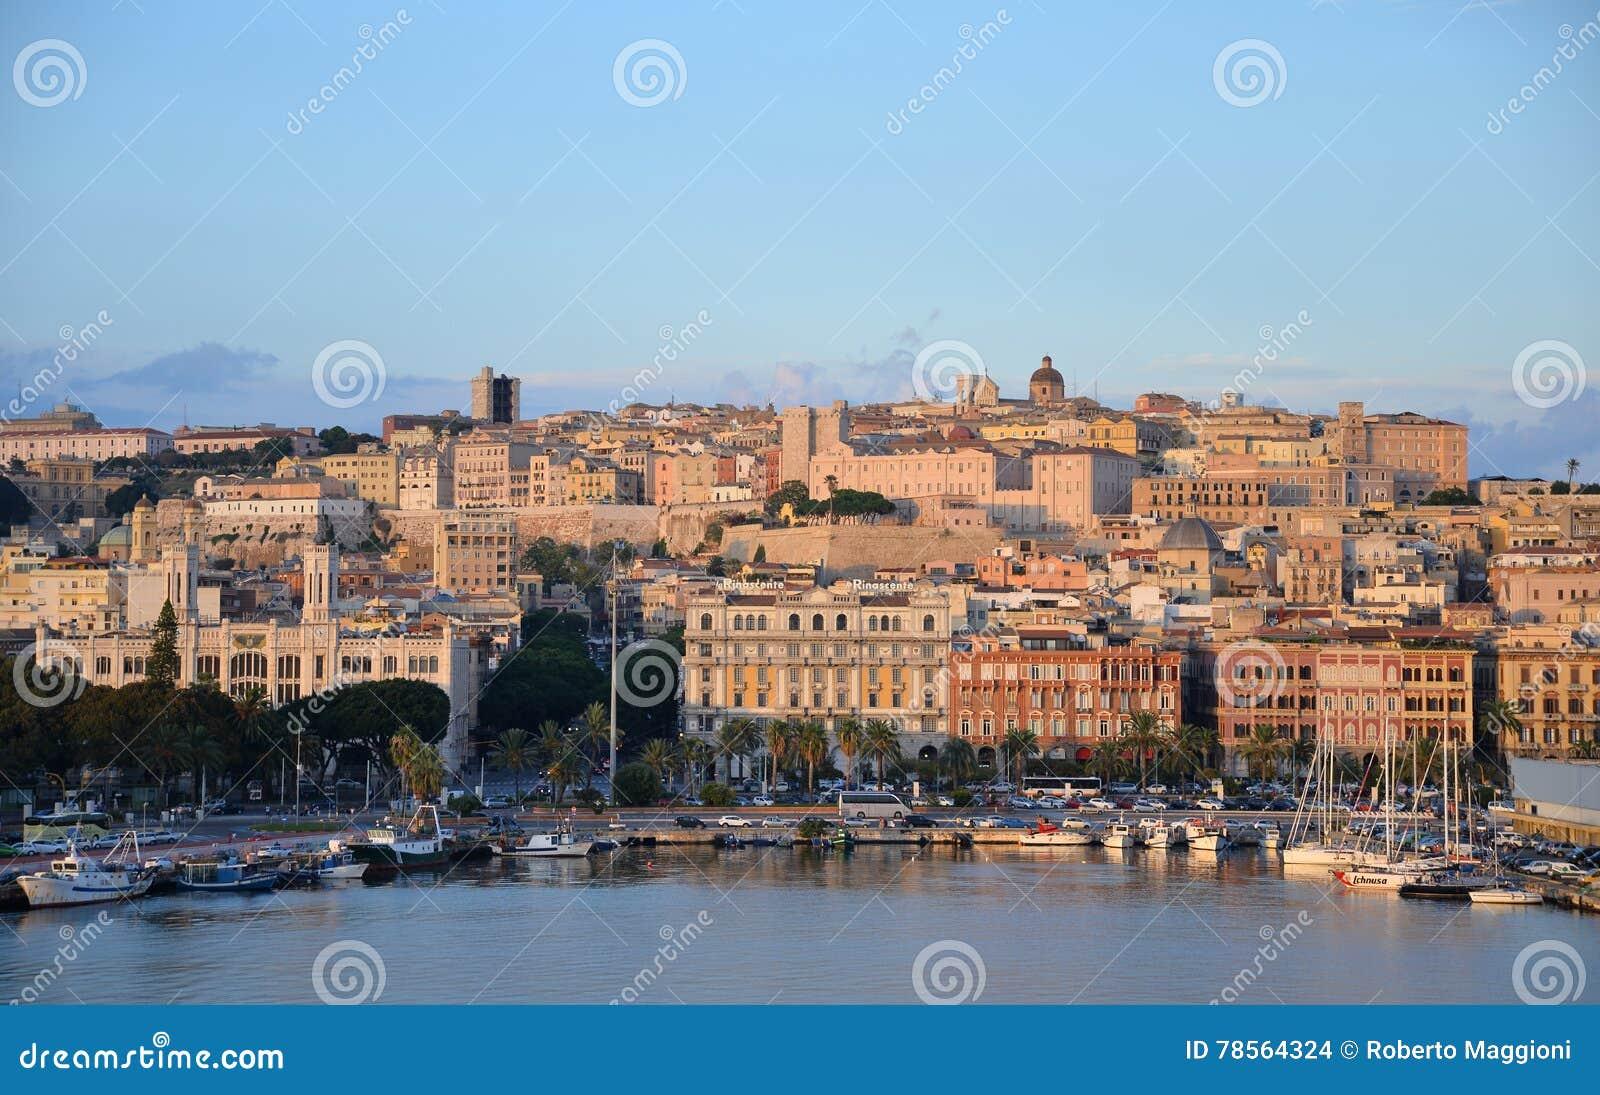 Ville de Cagliari, Sardaigne, Italie